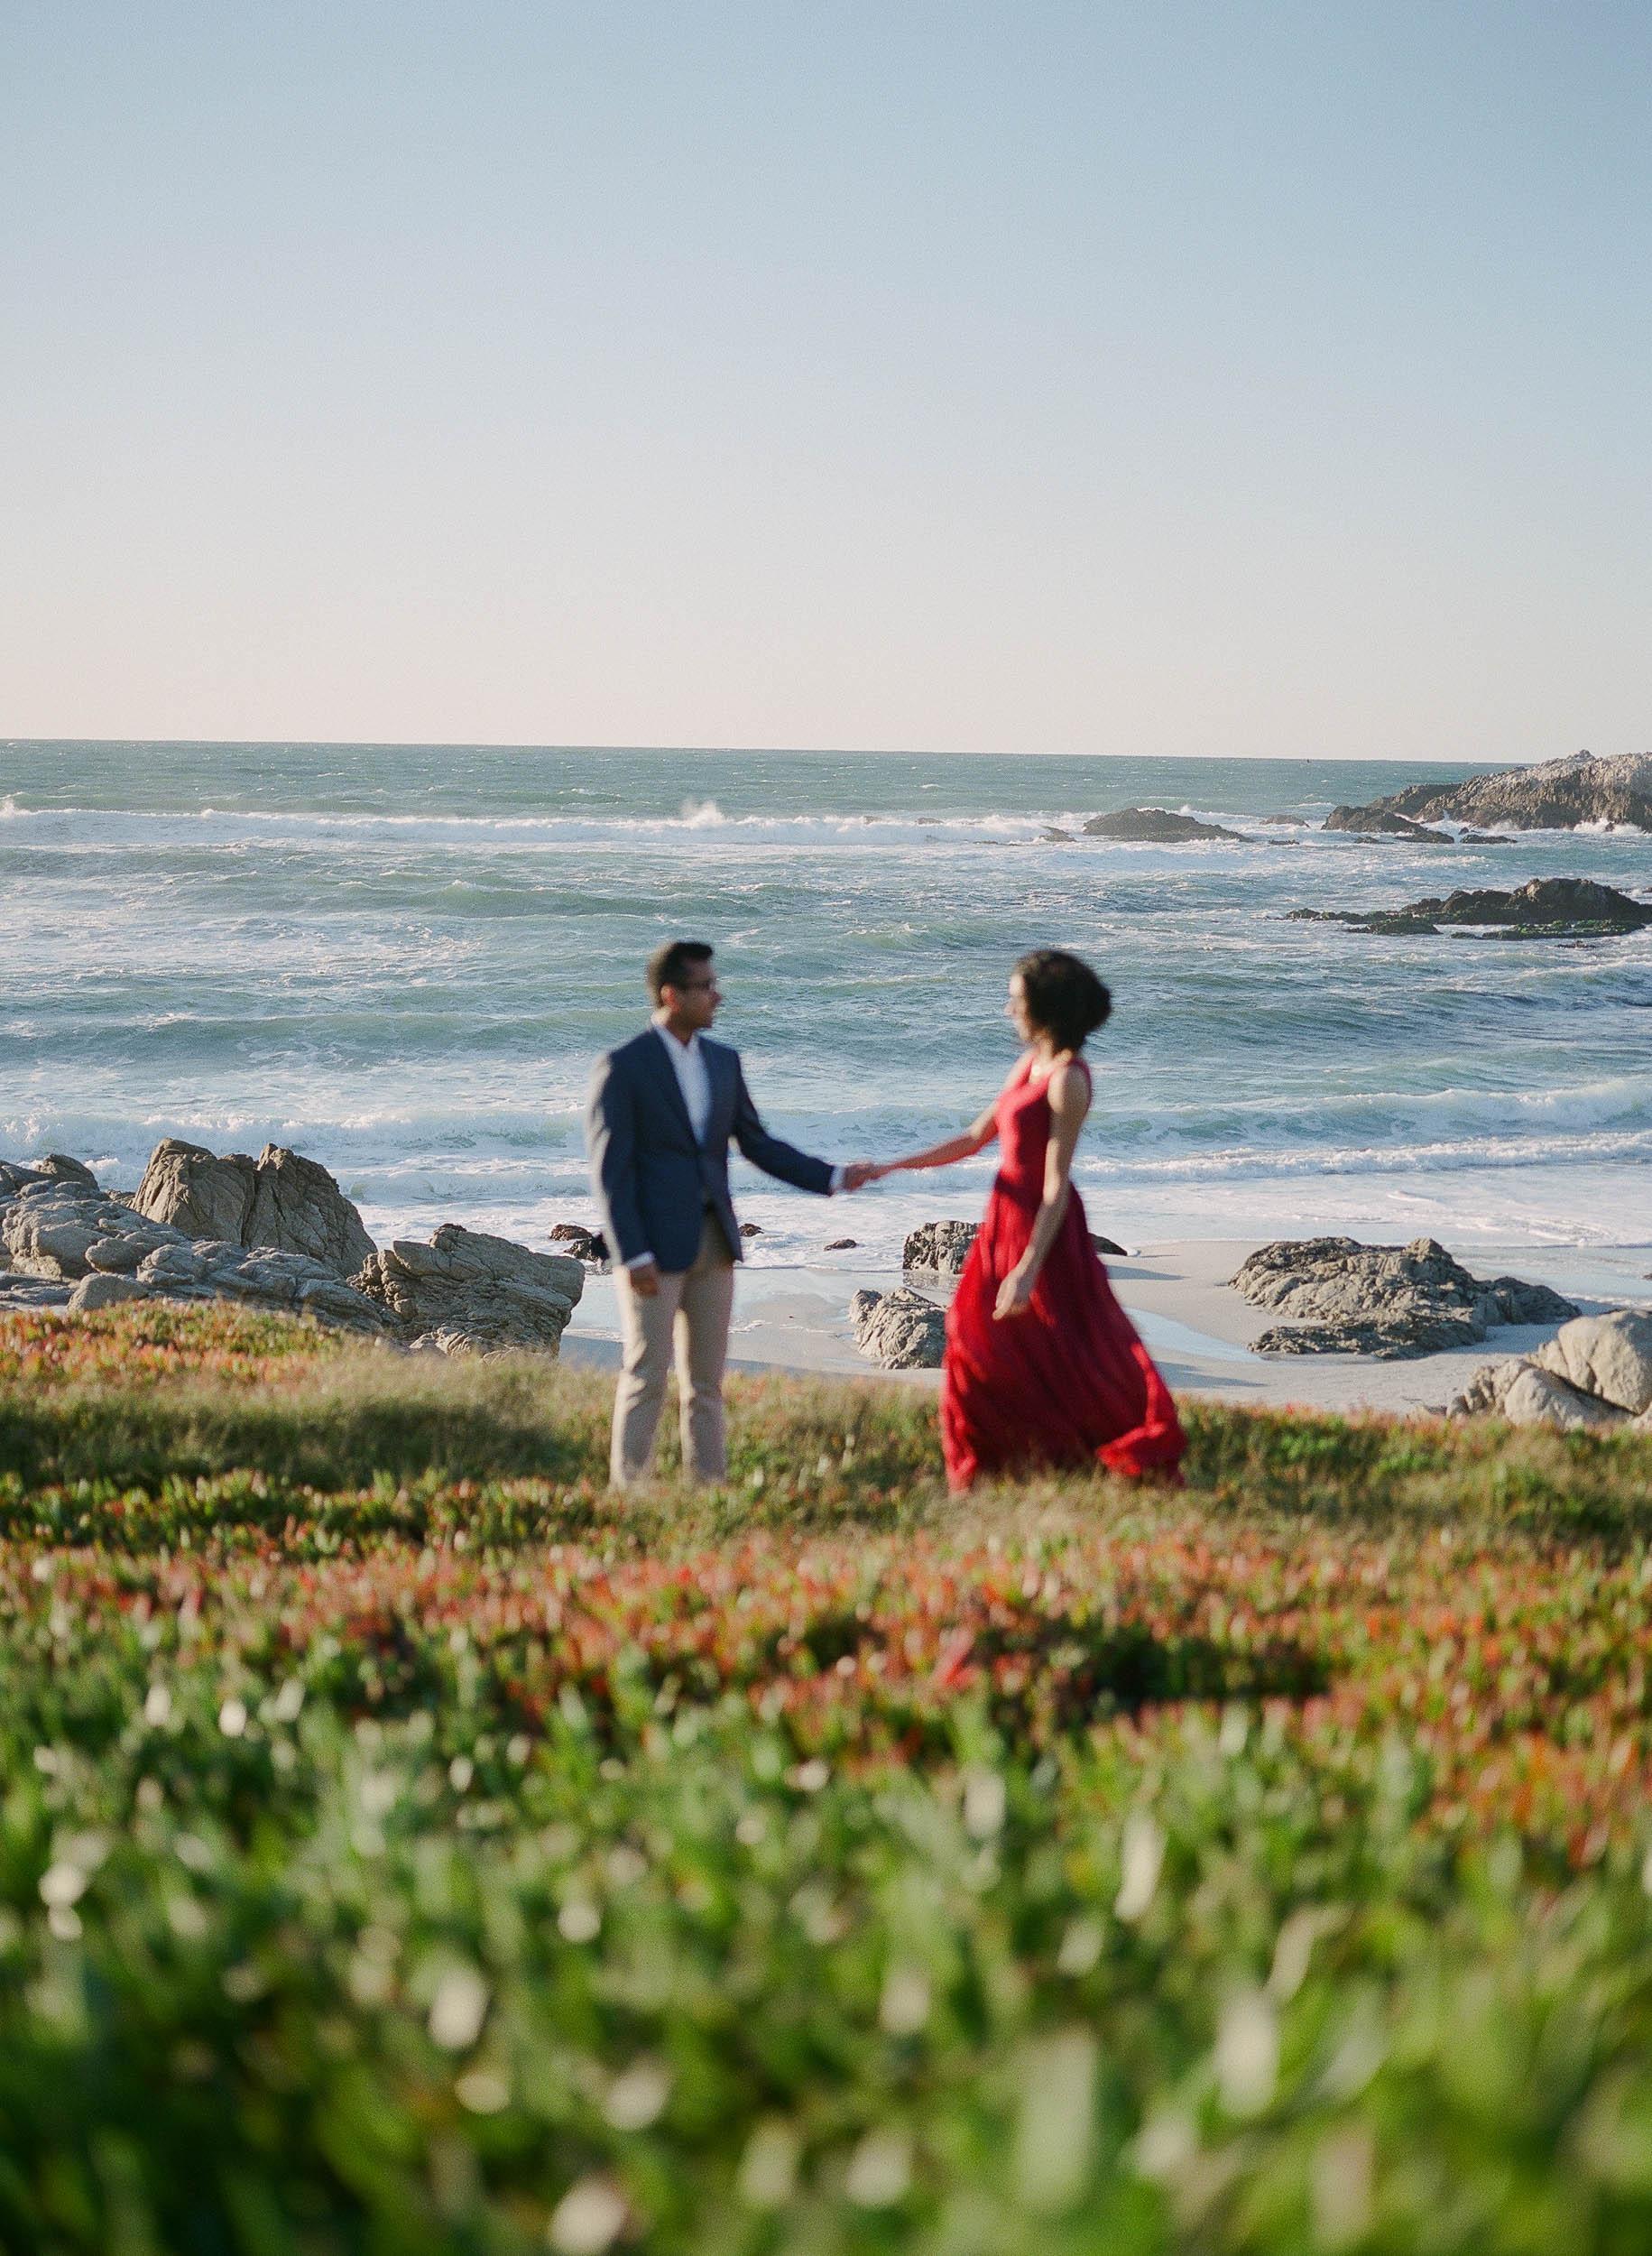 022619_H+Z Engagement_Carmel_Buena Lane Photography_83.jpg